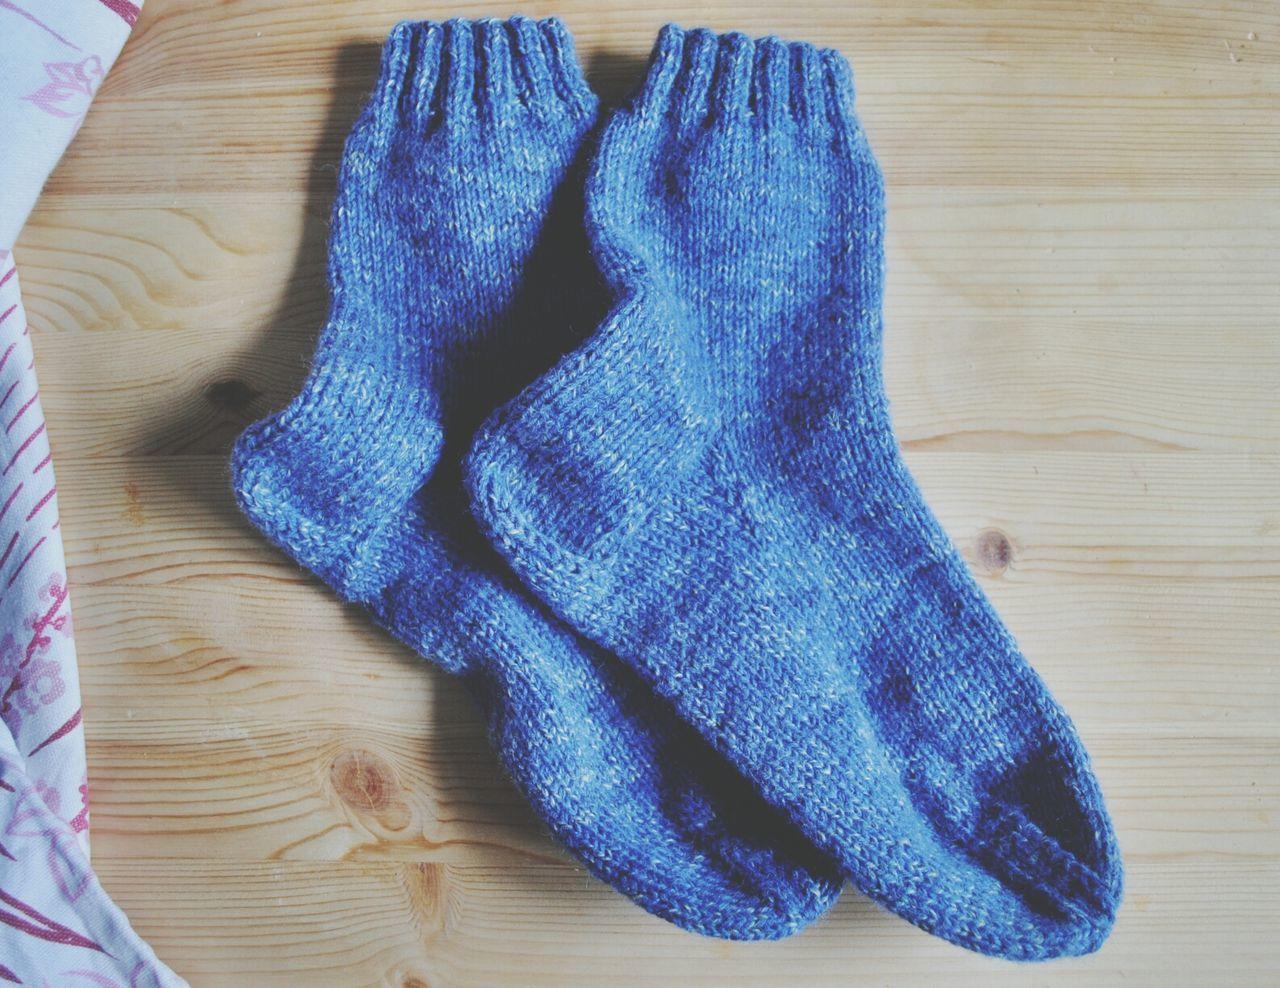 new pair for my husband's father)Knitting Handmade Hobby Socks